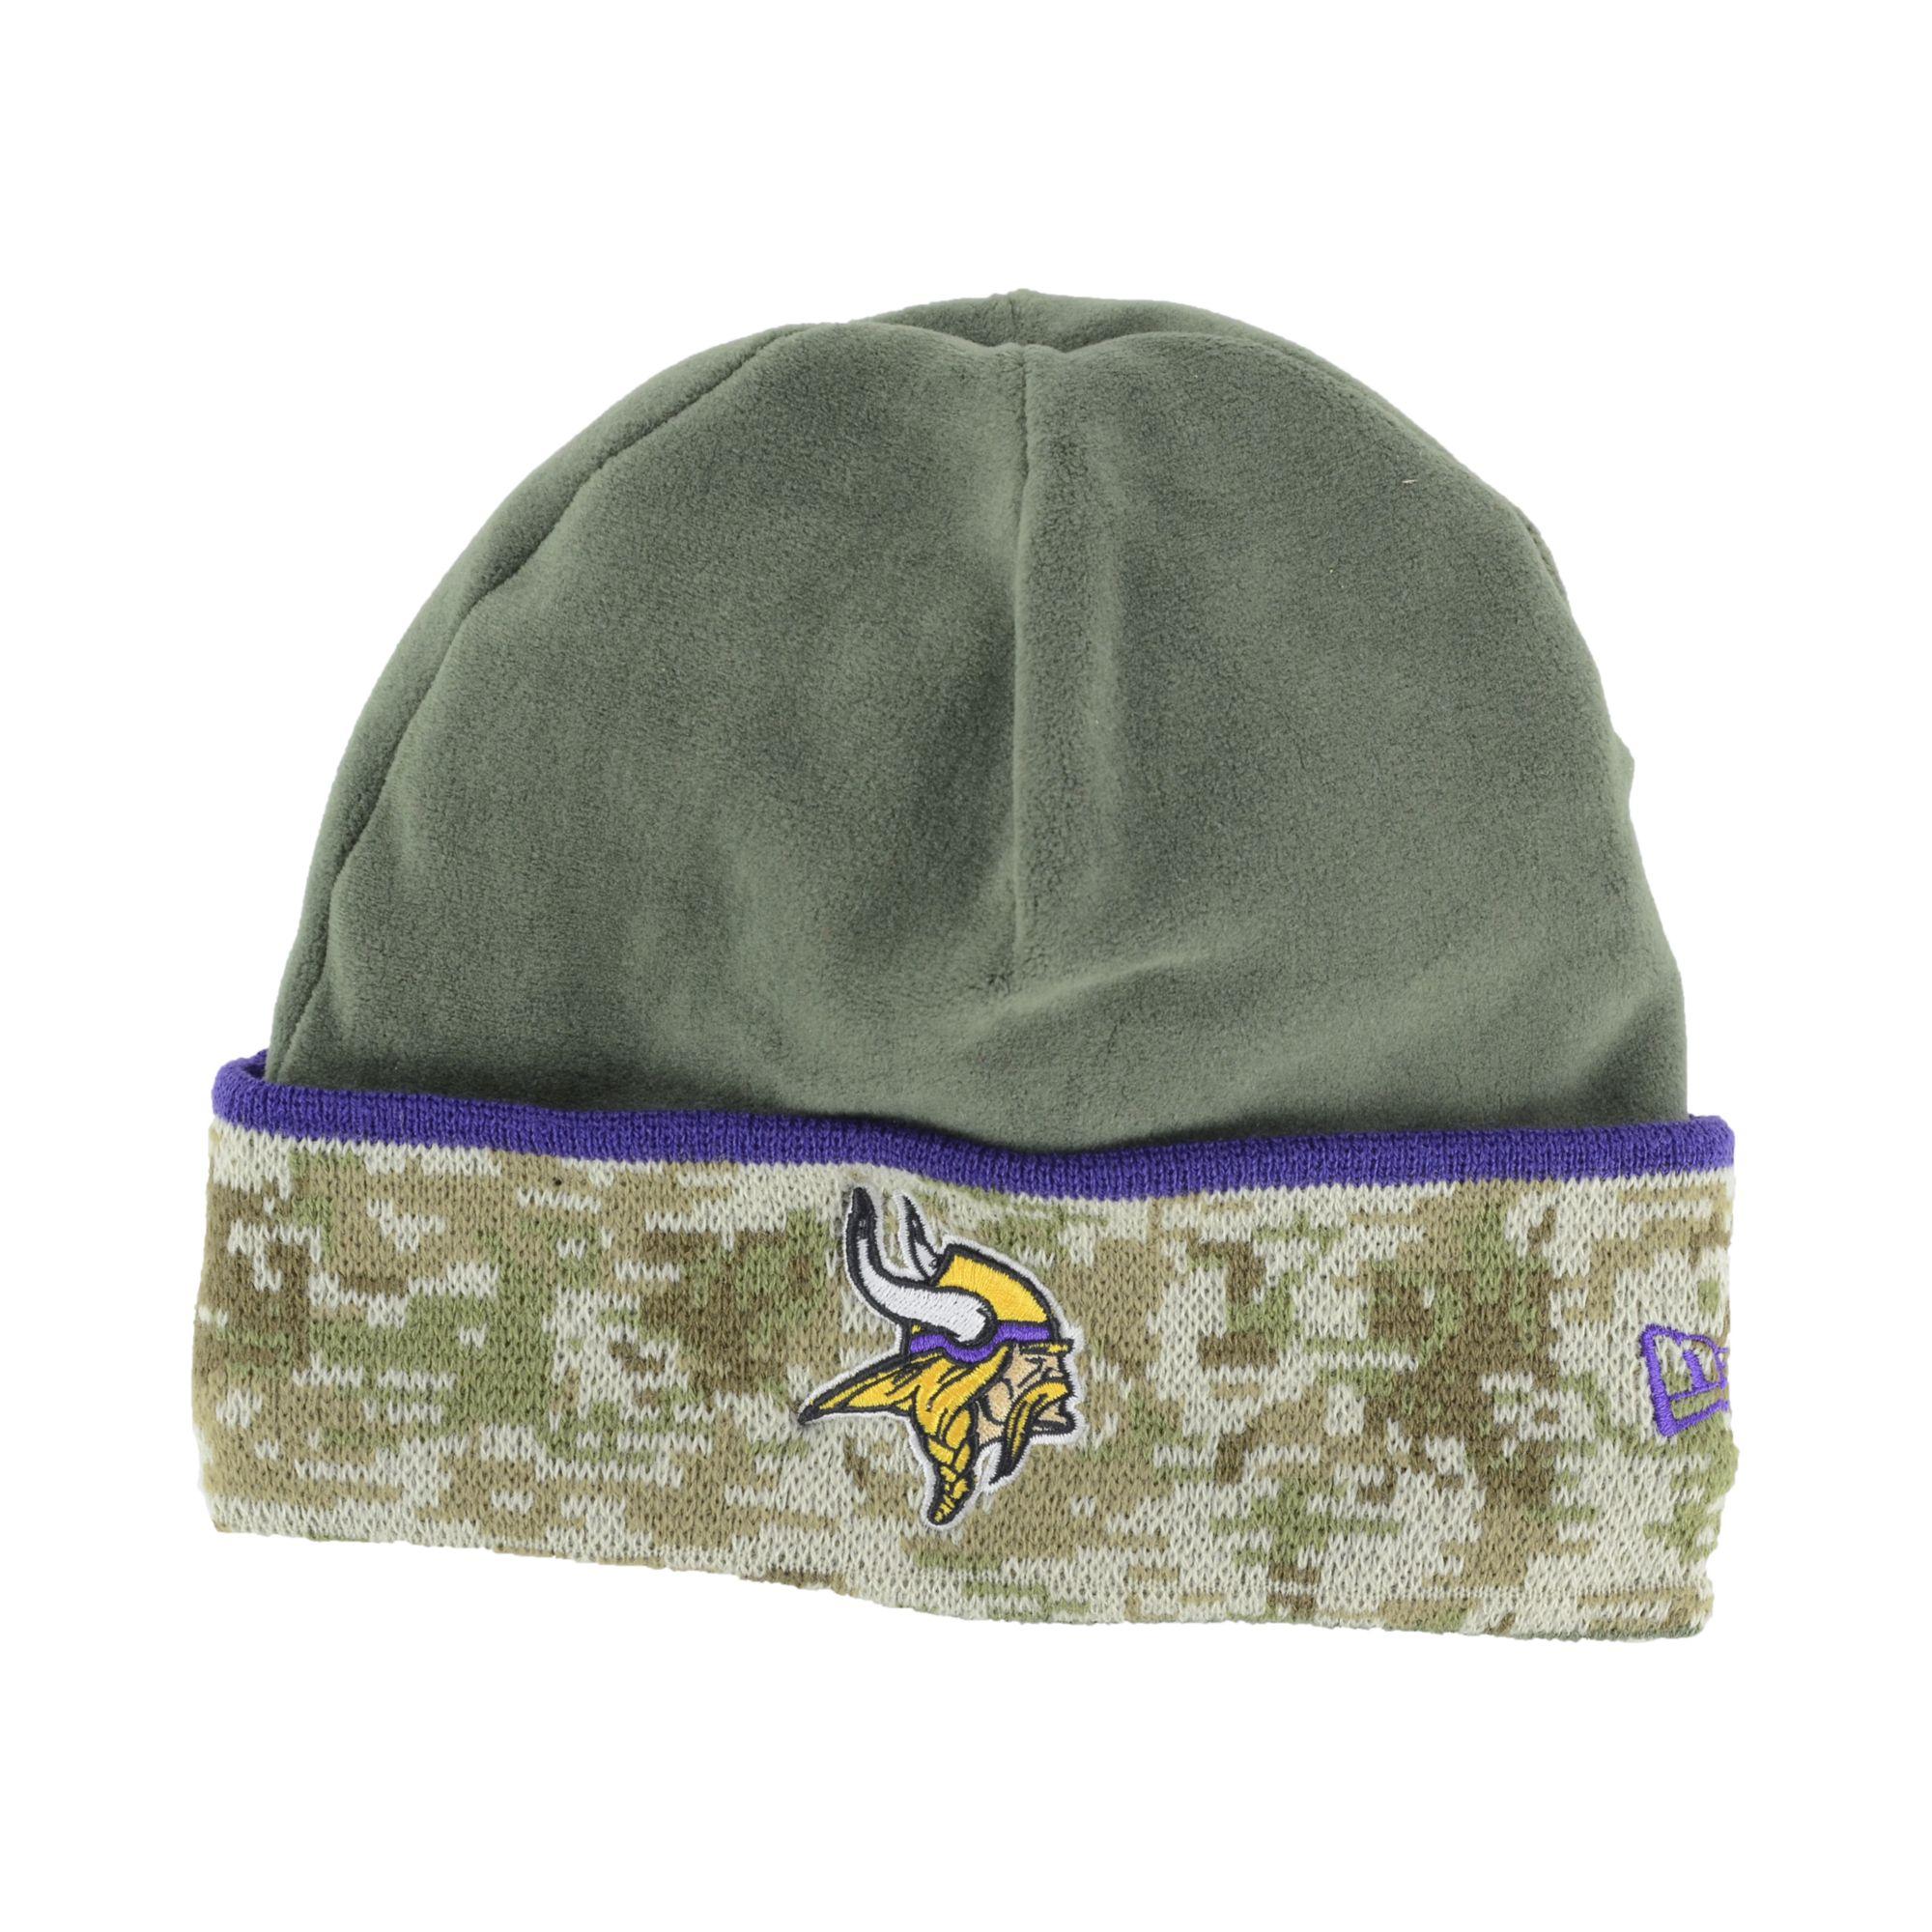 ... nfl new era knit beanie hat cap . efaba 3d75b  release date lyst ktz  minnesota vikings salute to service knit hat in green for men f1841 cd85da19f